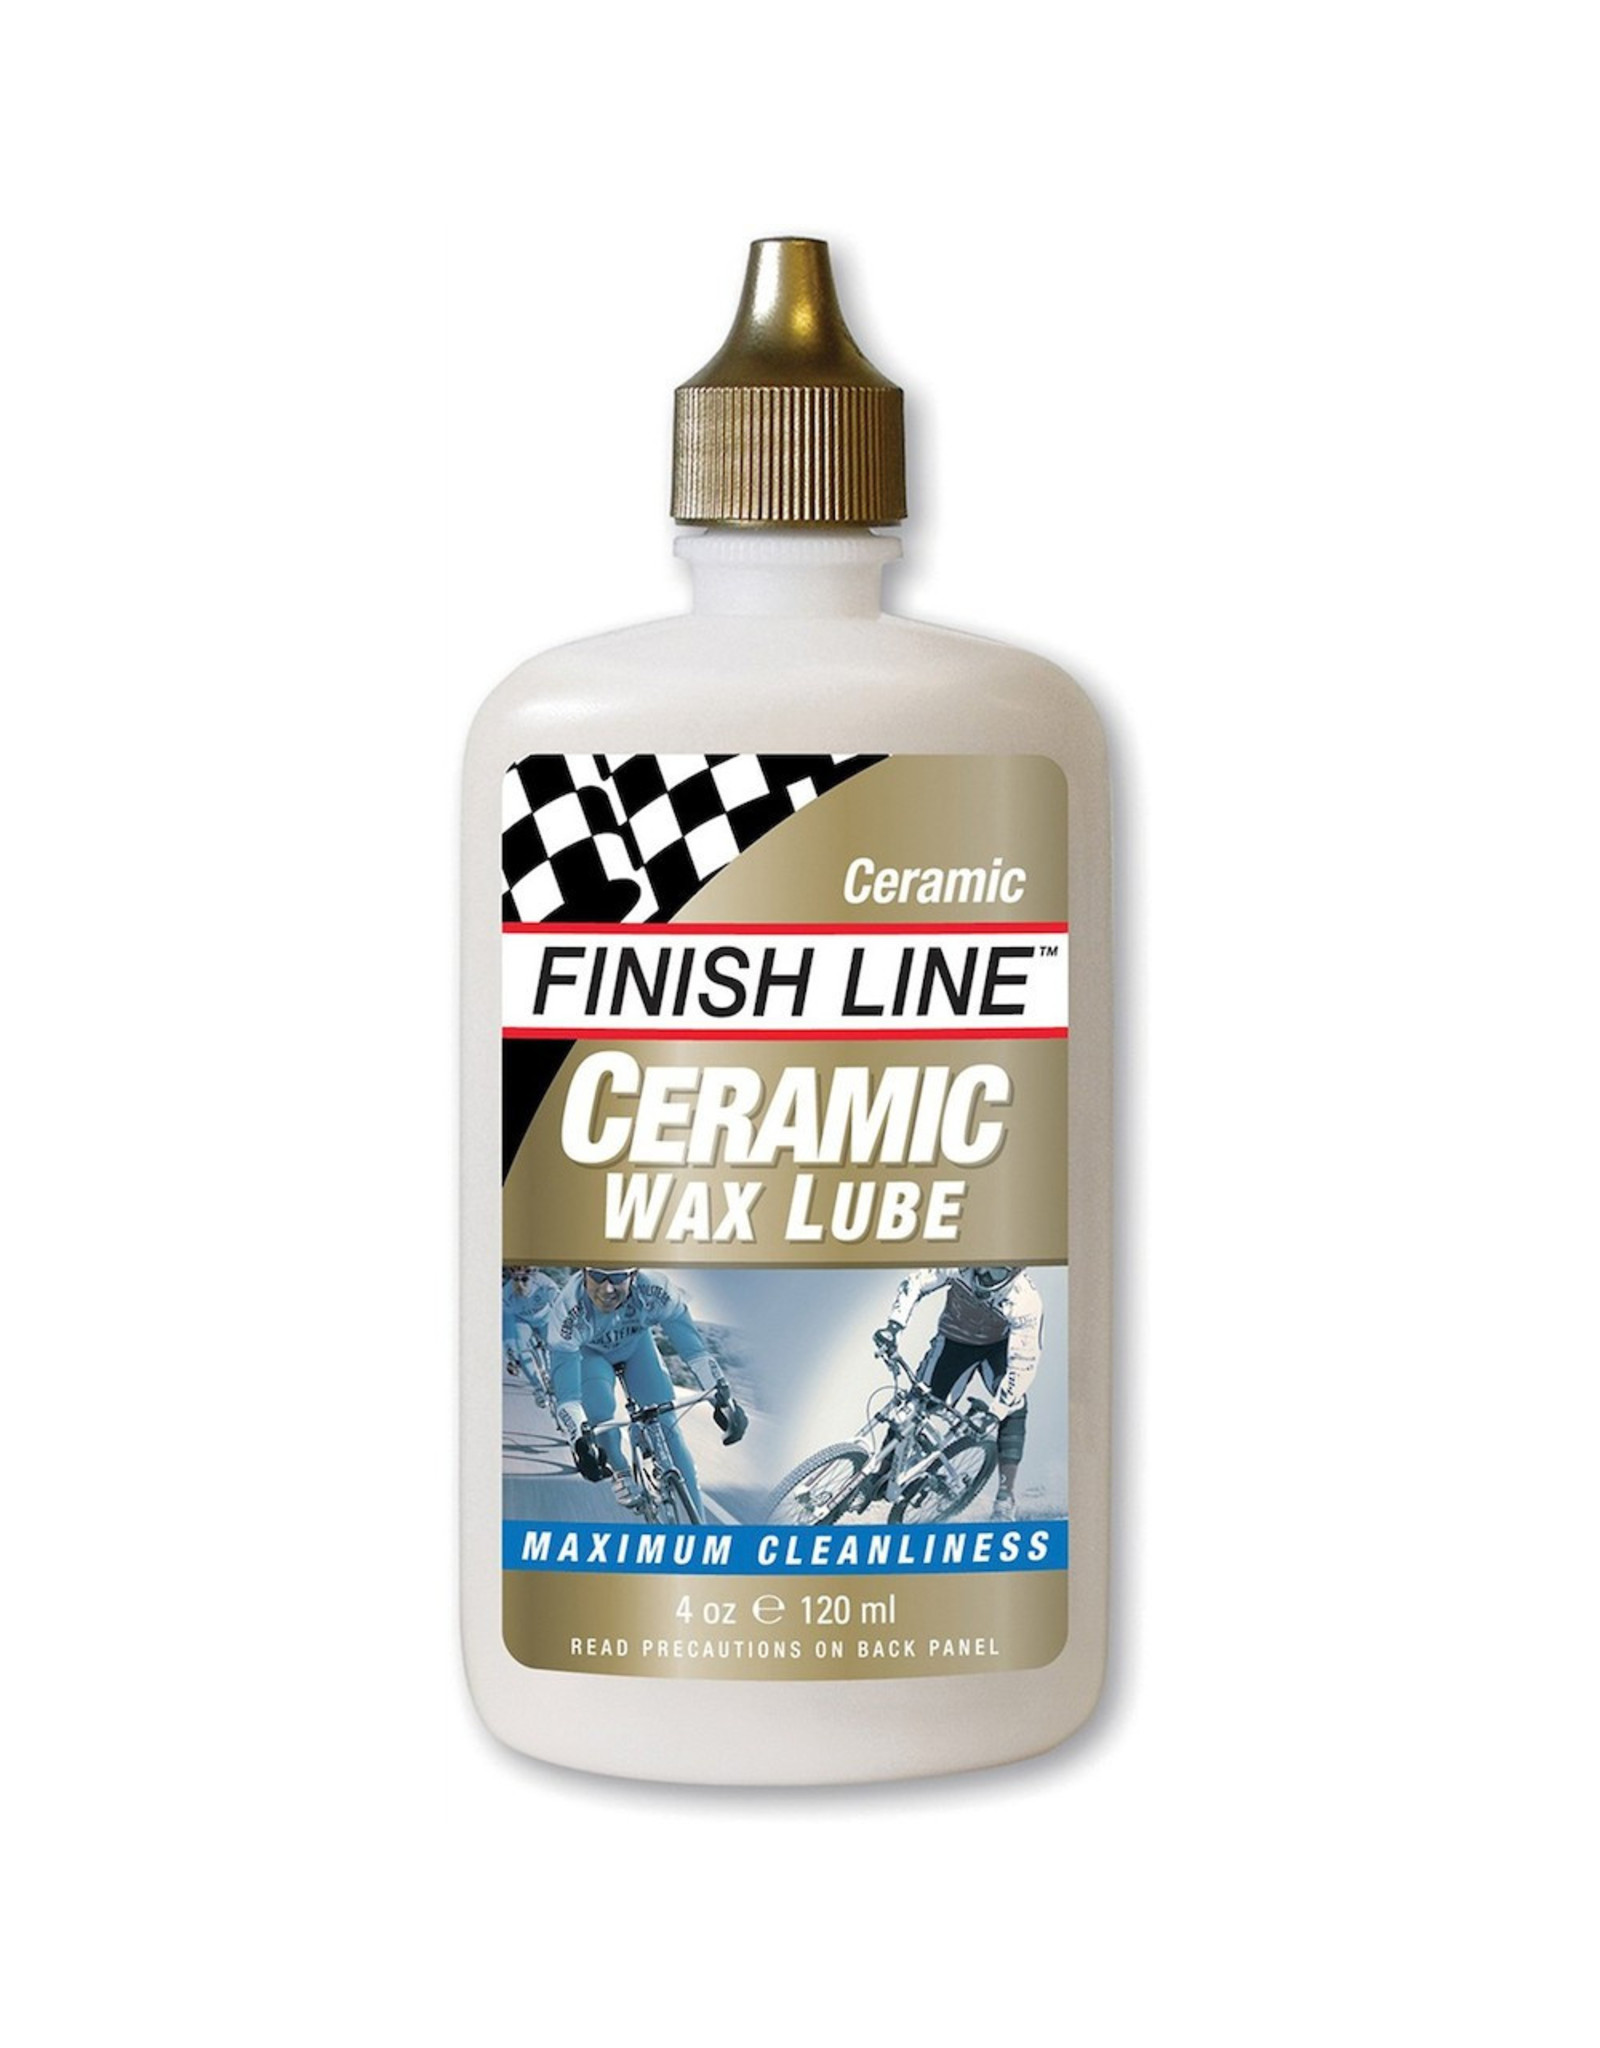 Finish Line Finish Line Ceramic Wax Chain Lube, 2oz